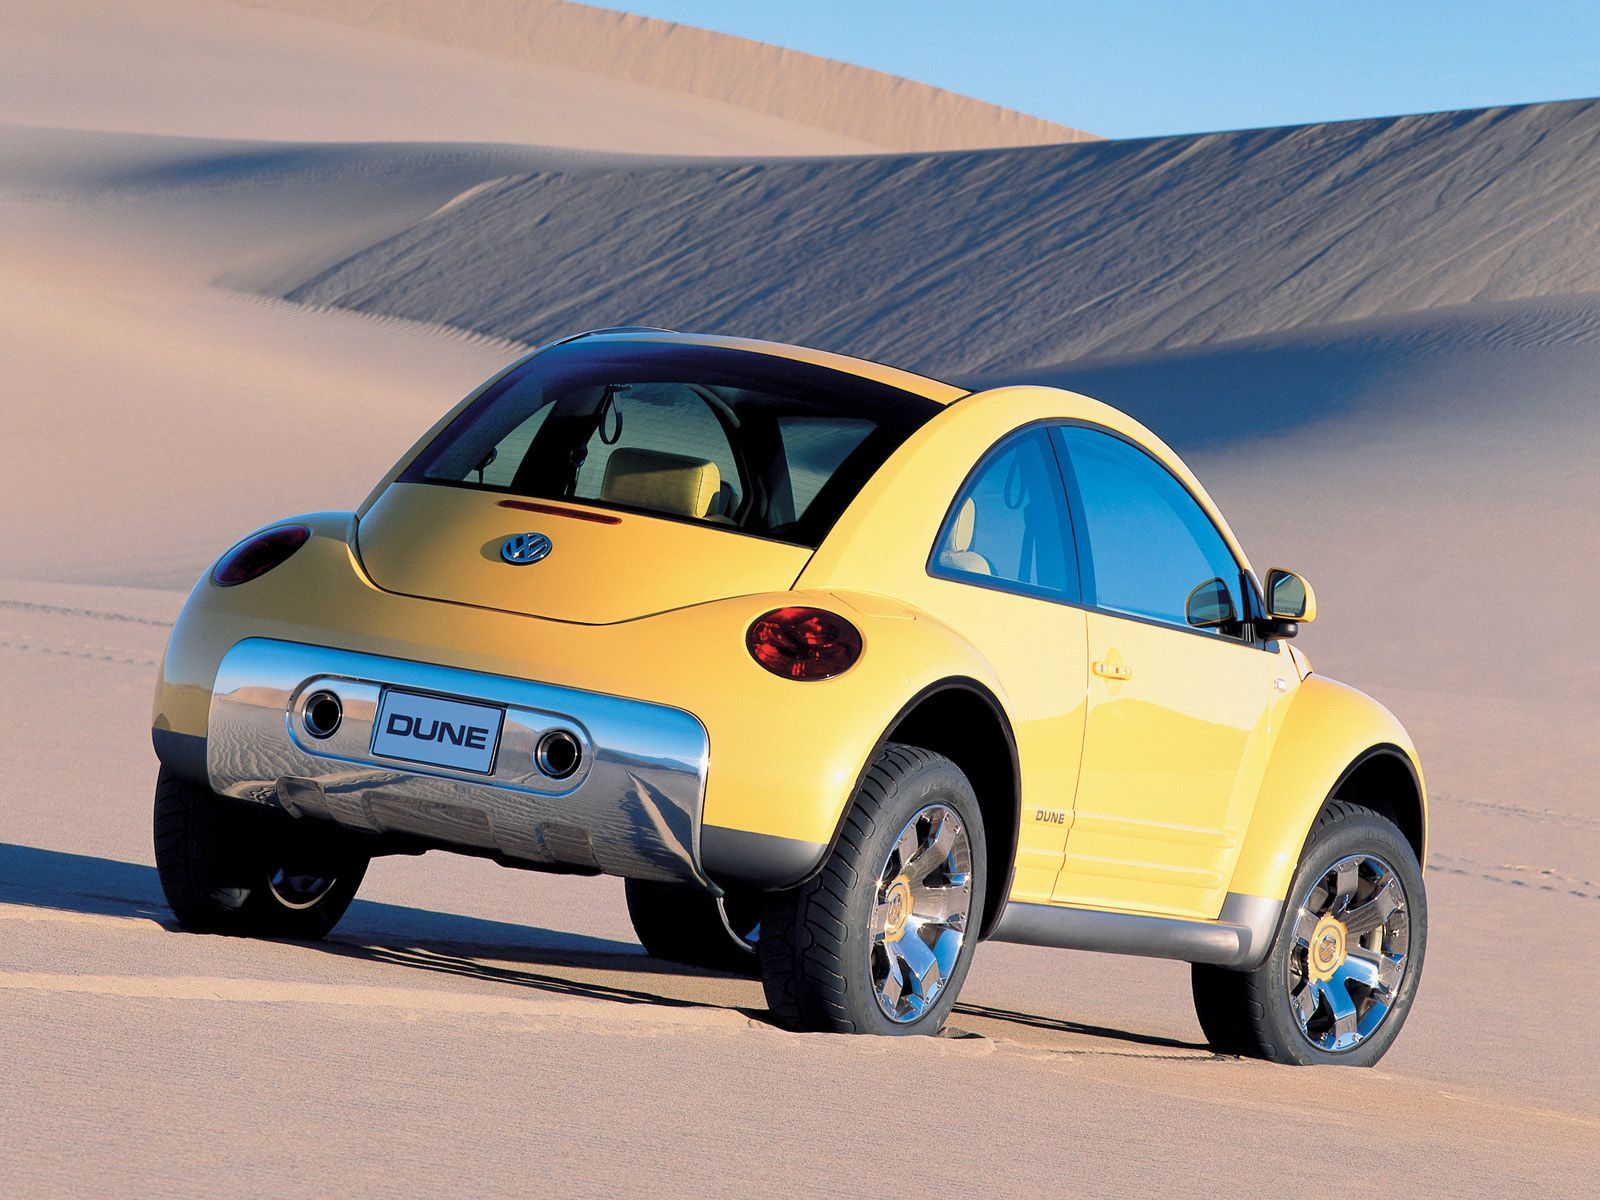 car pictures volkswagen new beetle dune. Black Bedroom Furniture Sets. Home Design Ideas